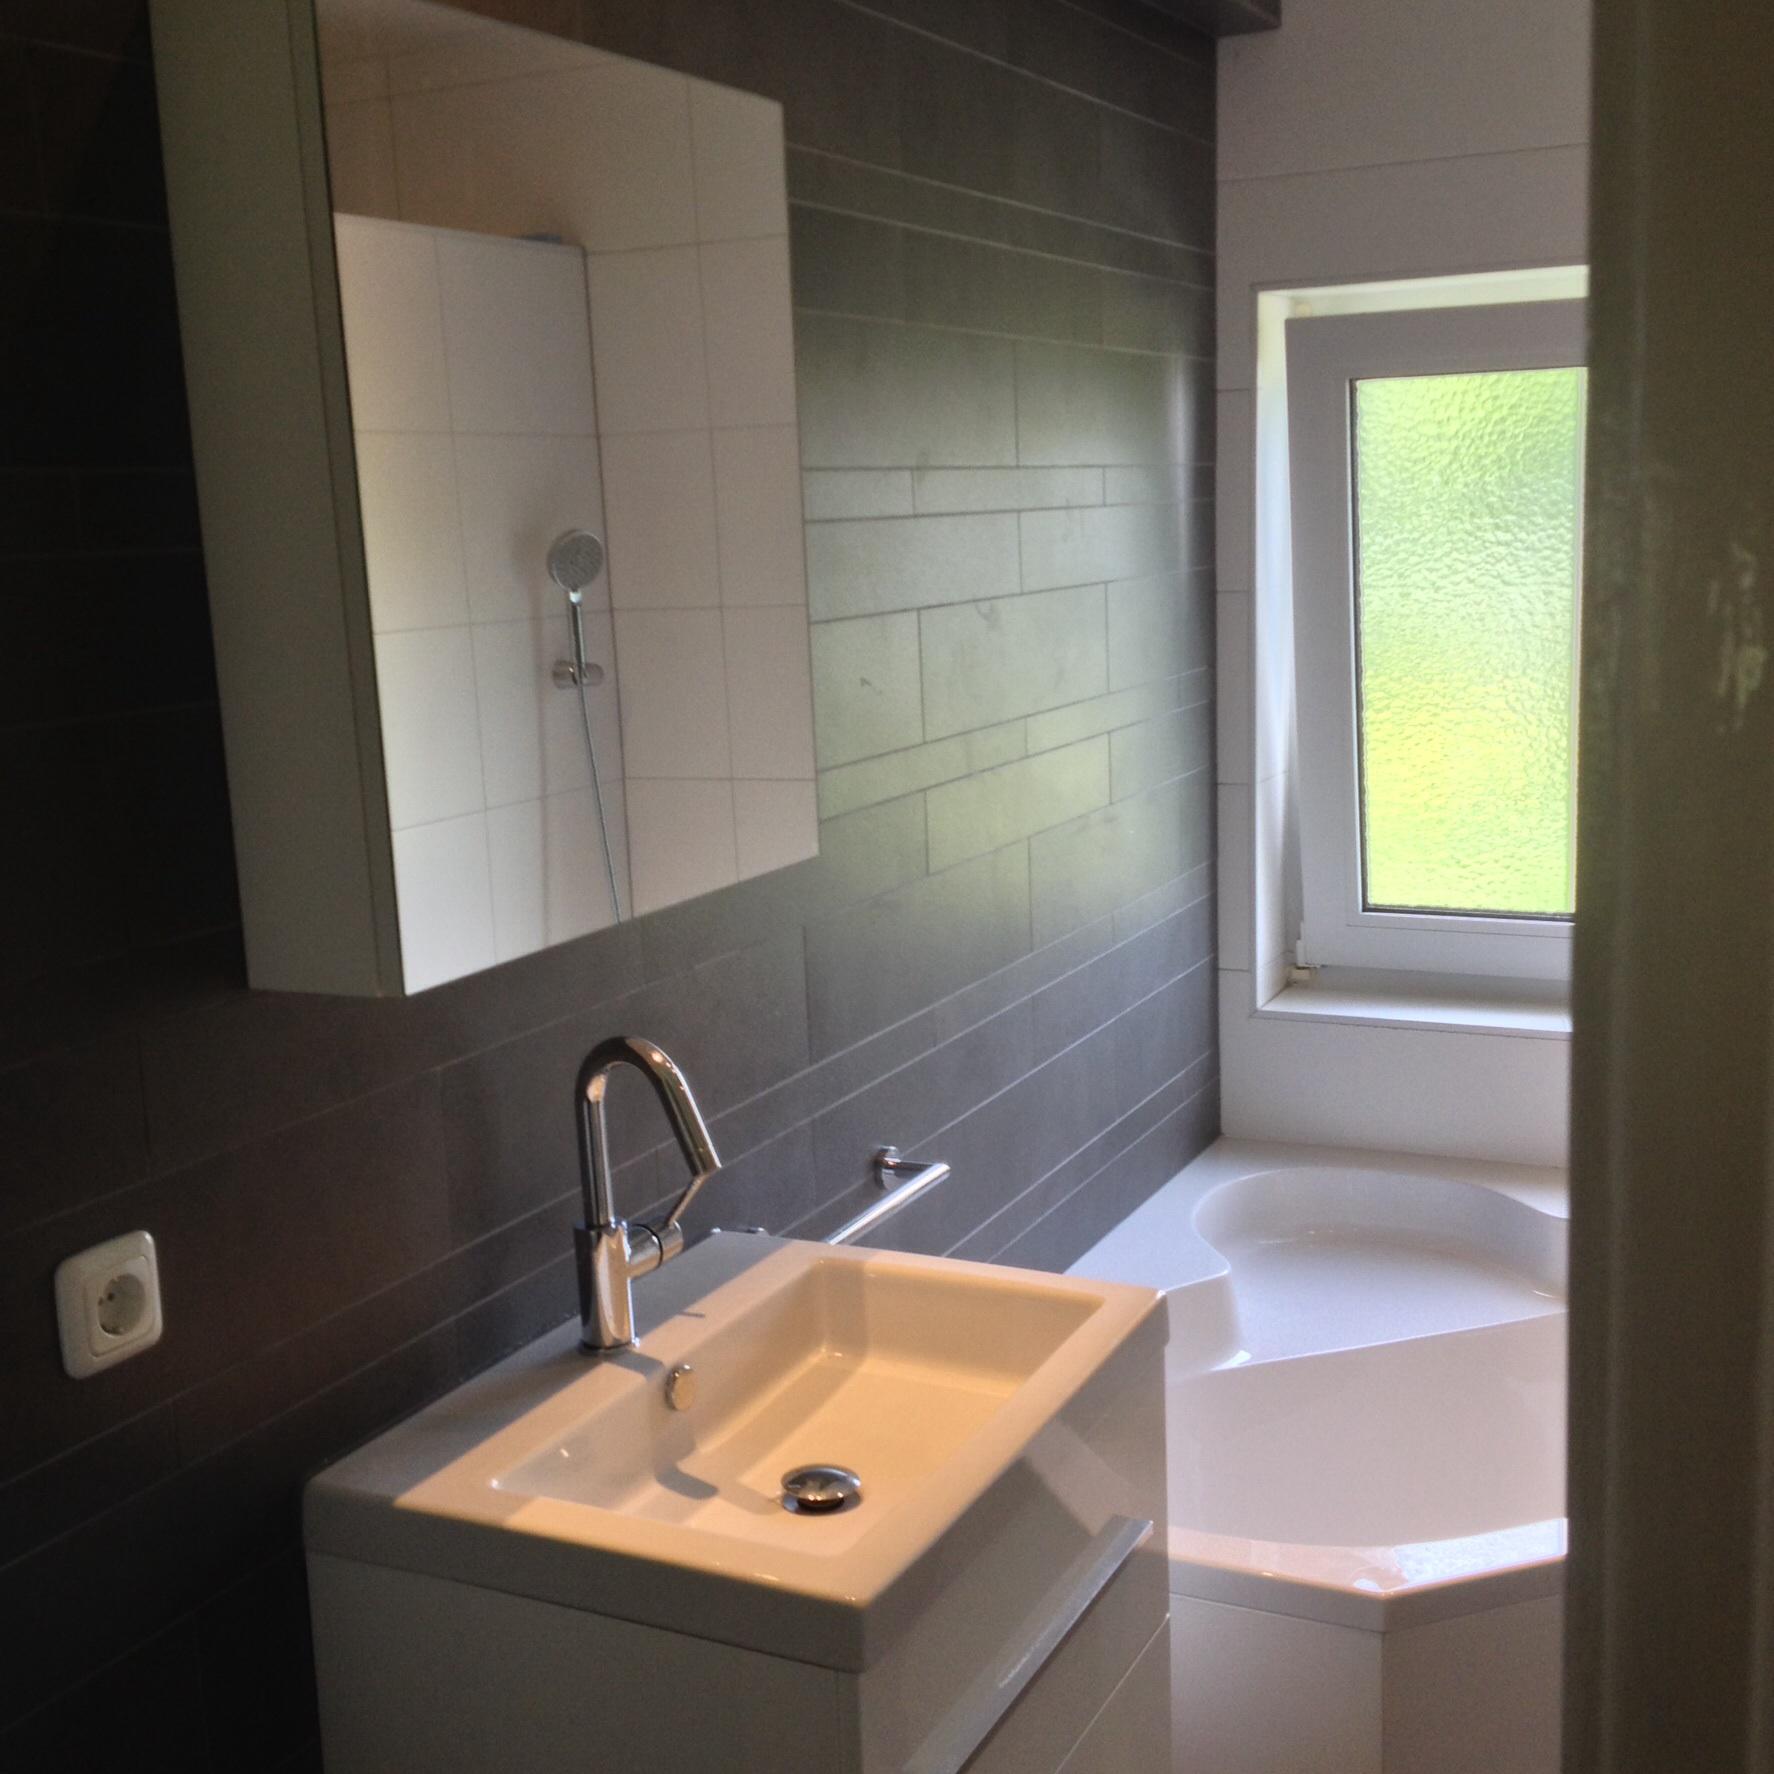 Badkamer met hoekbad - Timmer- en Klussenbedrijf H. Driesen